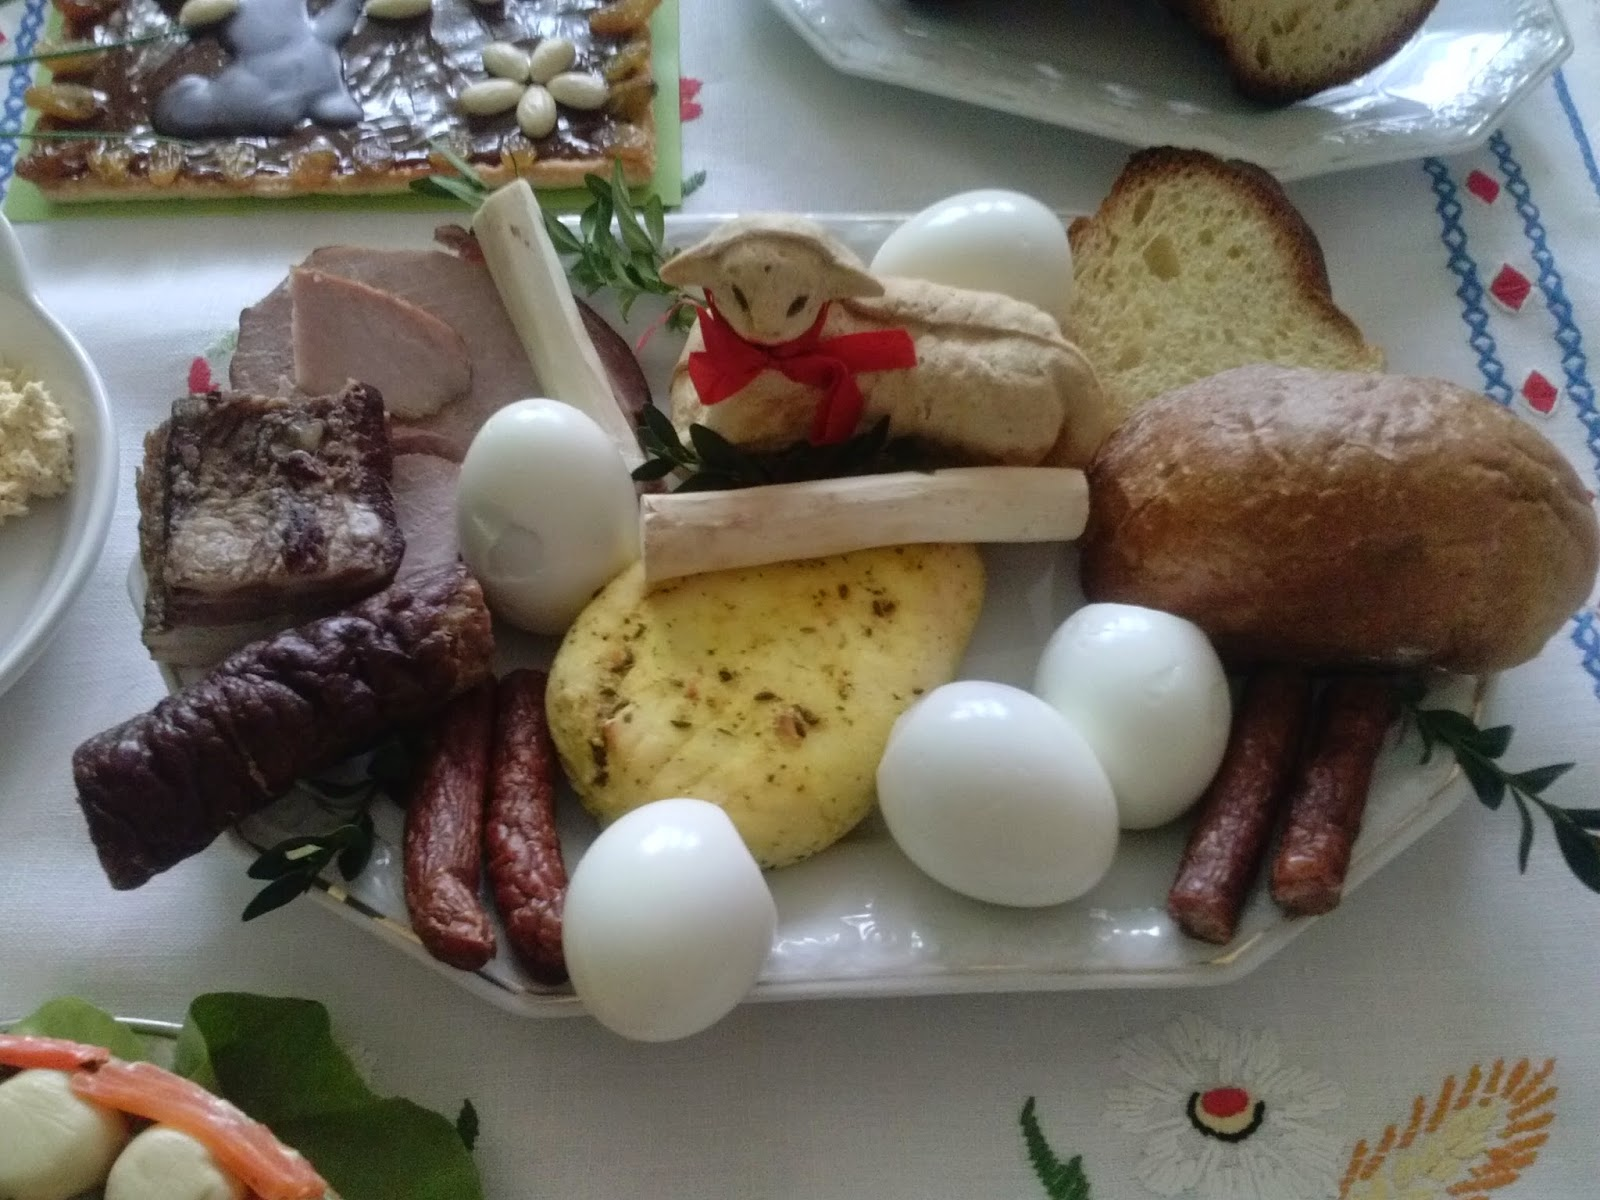 Moja Kuchnia Pachnaca Barszczem Gomolkowy Ser Do Barszczu